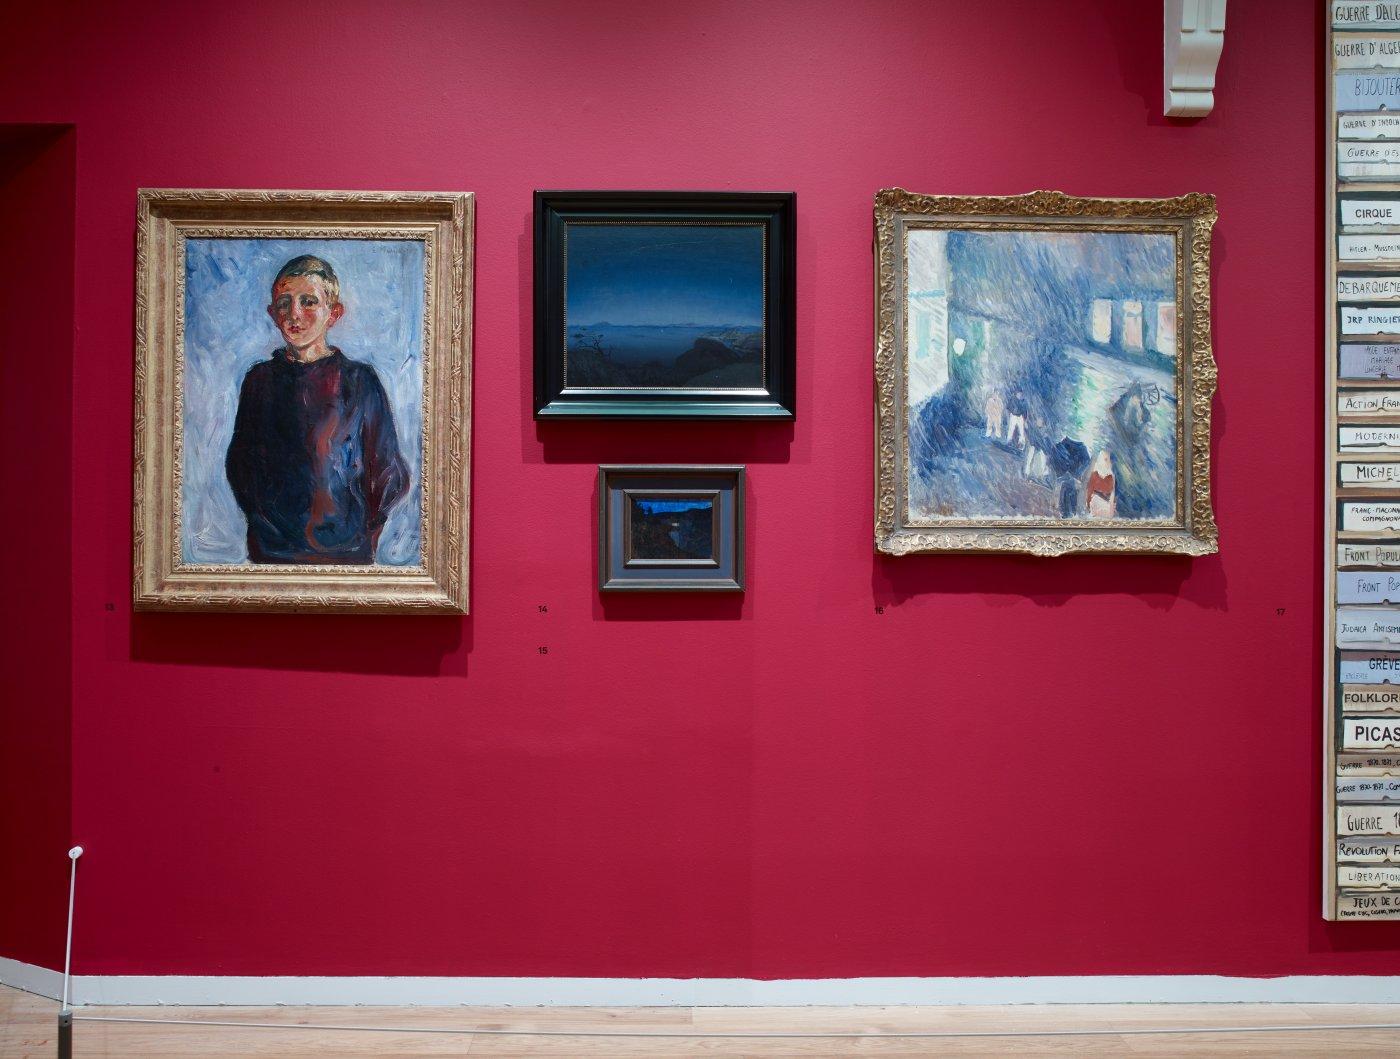 Whitechapel Gallery Christen Sveaas Art Collection 10